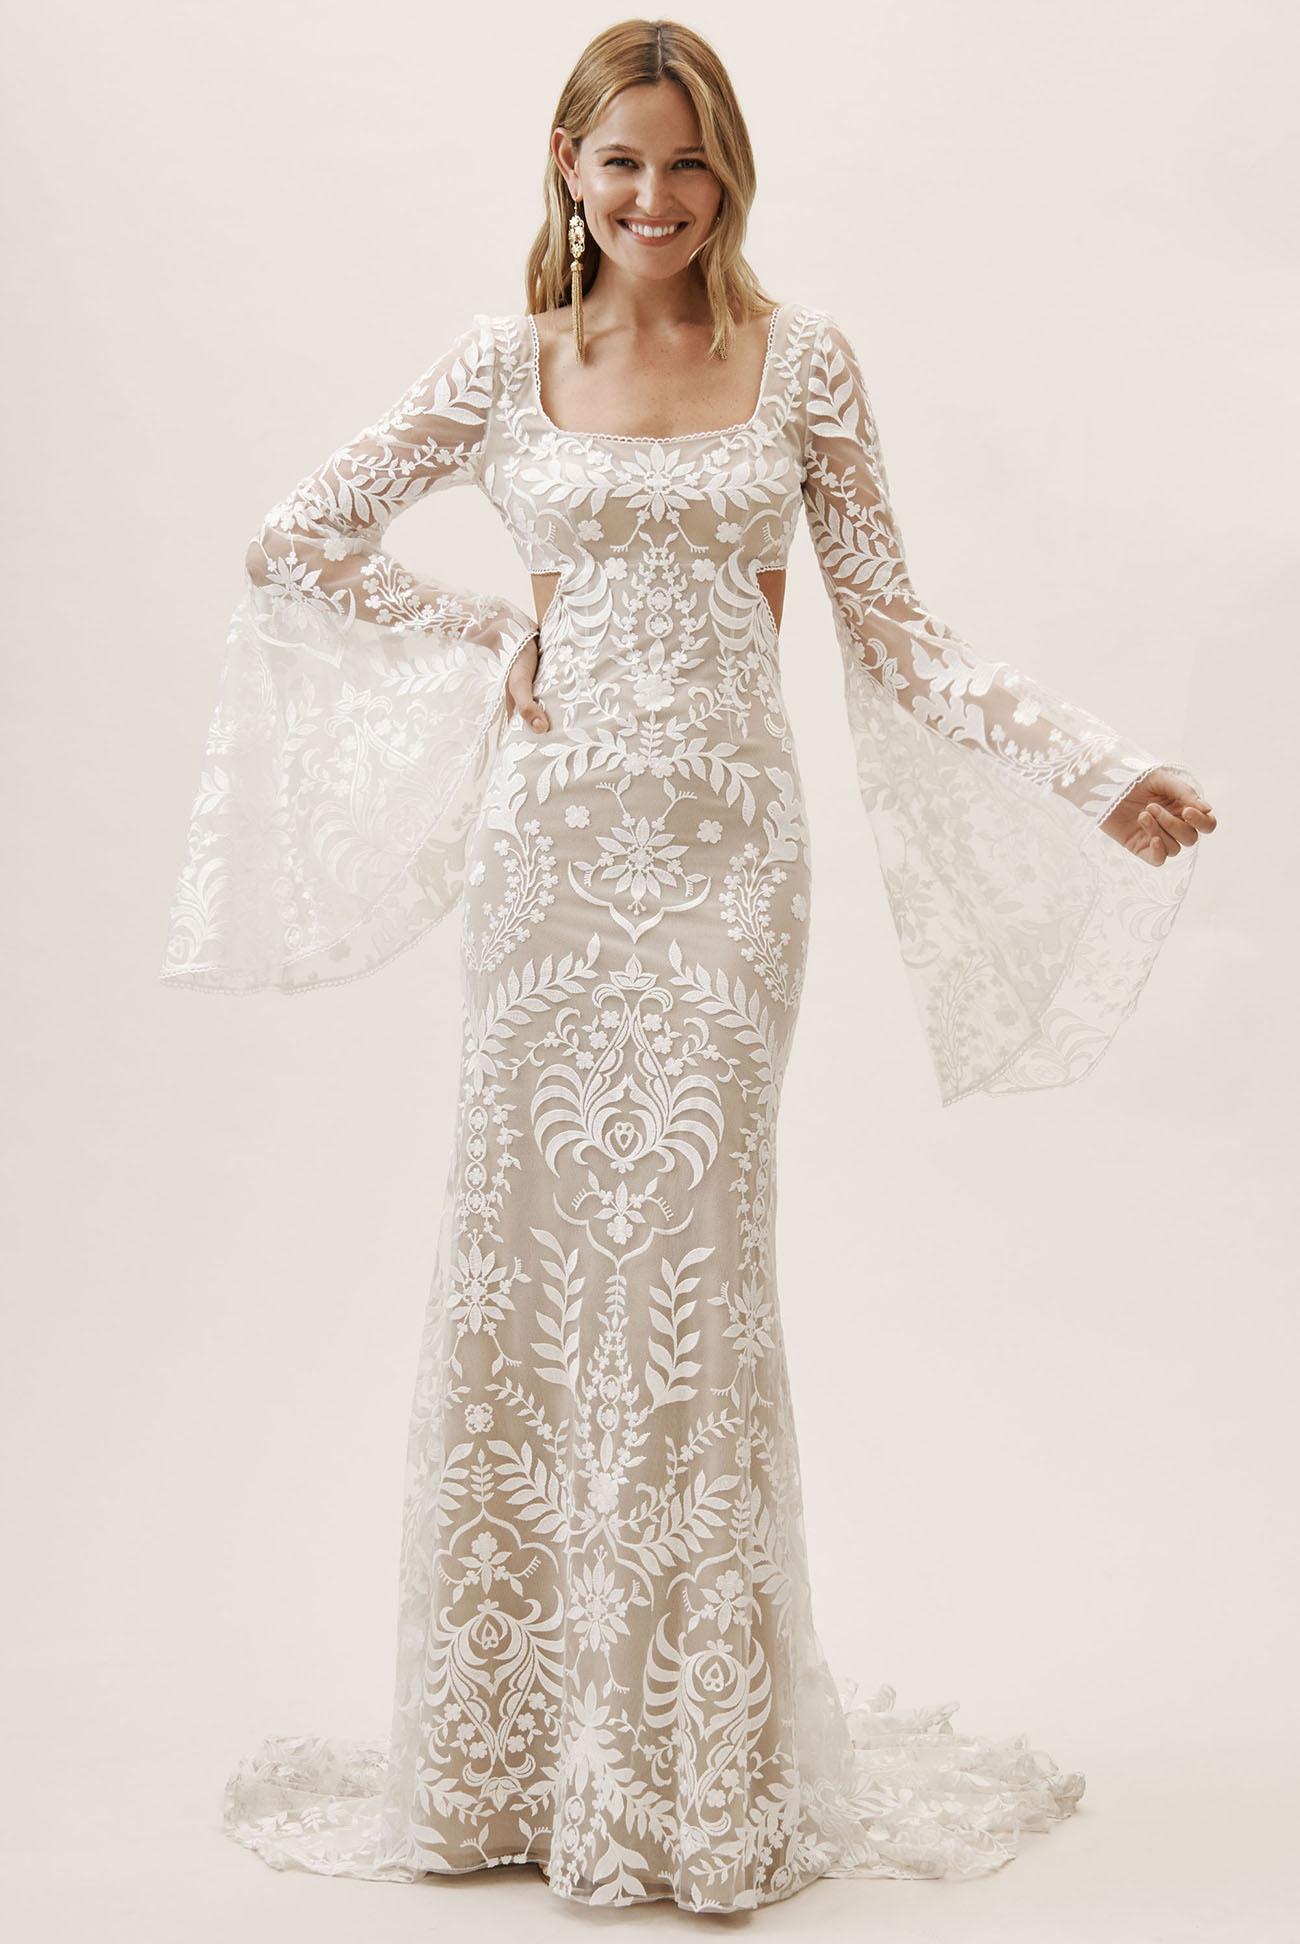 Bhldn Goes Bohemian See The Boho Wedding Dresses Our Free Spirits